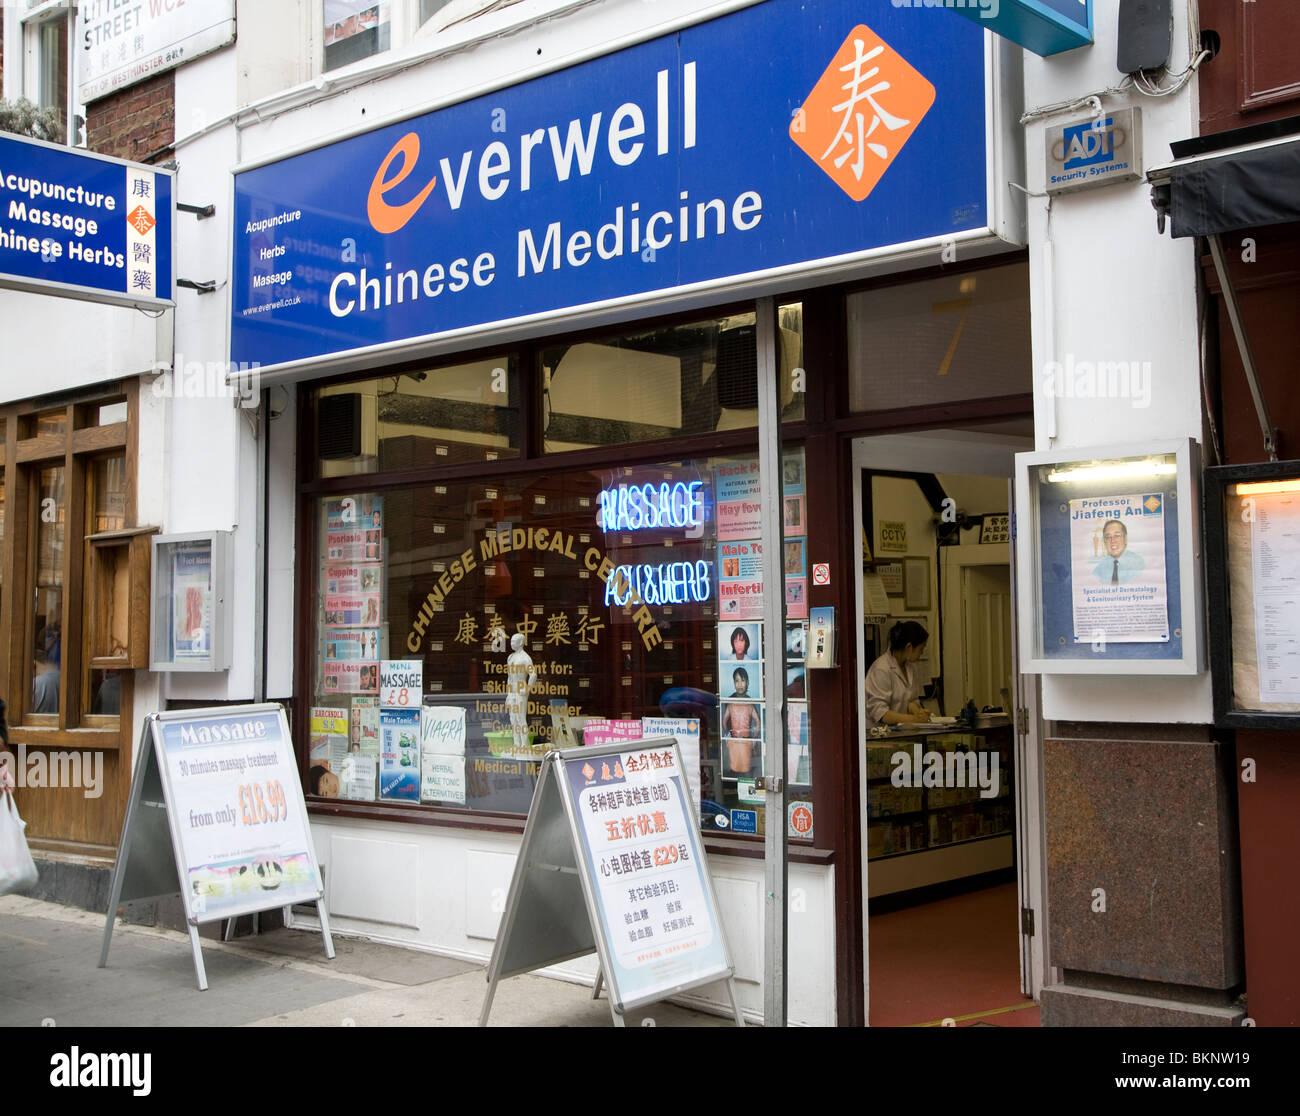 Chinese medicine shop, Chinatown, Soho, London, England Stock Photo